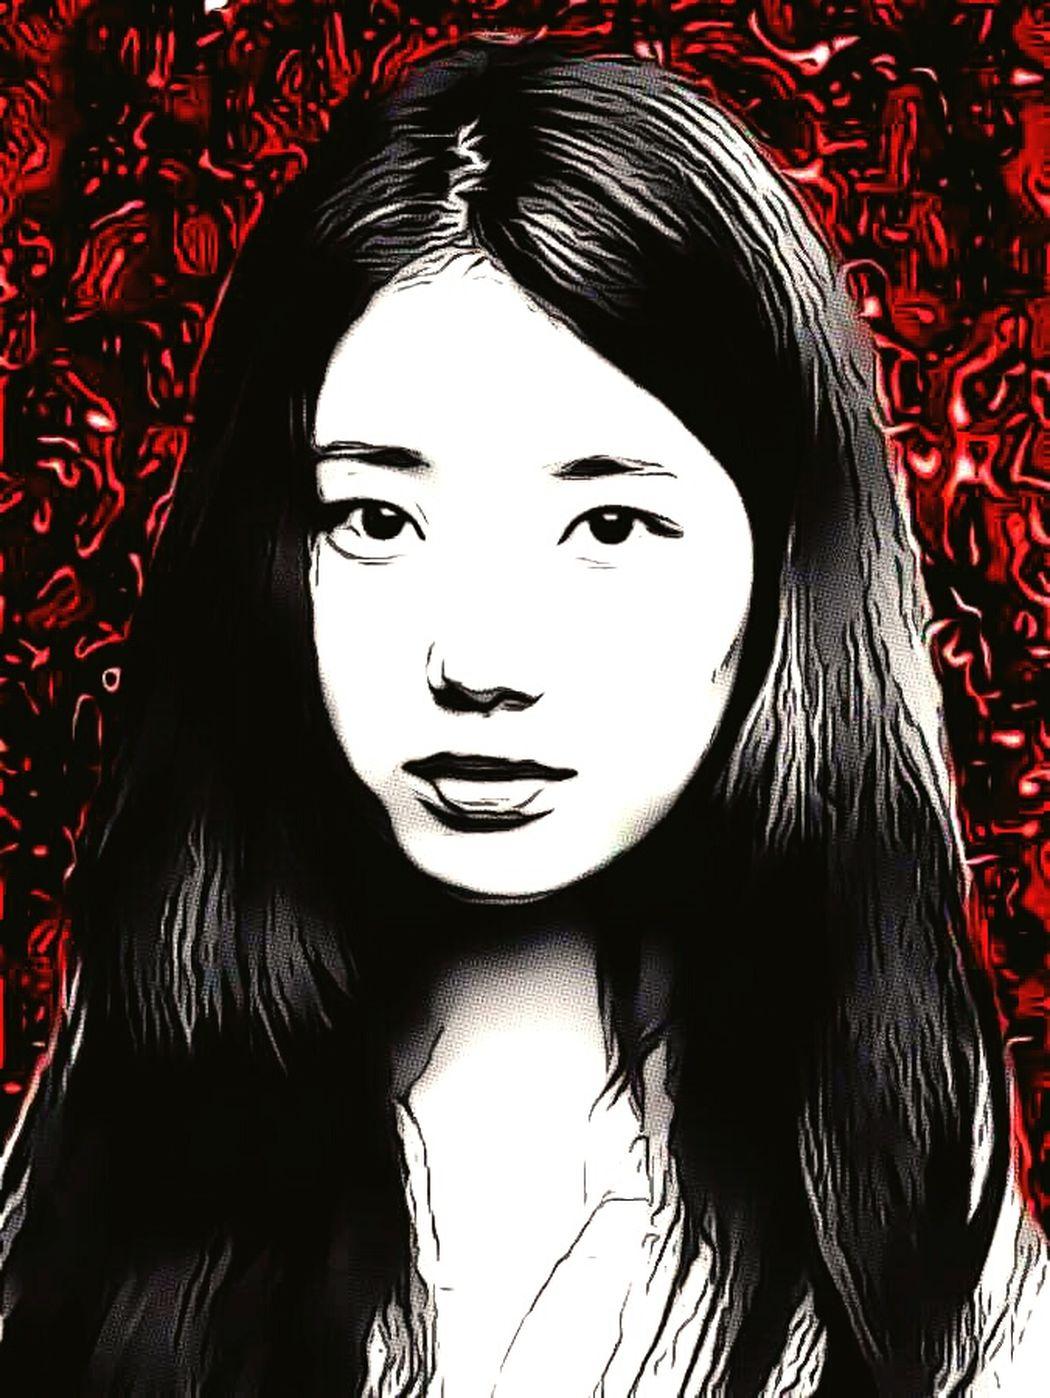 Portrait Long Hair Red Only Women Young Women Close-up Headshot Adult Women MyEdit Edited Edit One Person Gore Eeoguro Korea Korean Korean Woman